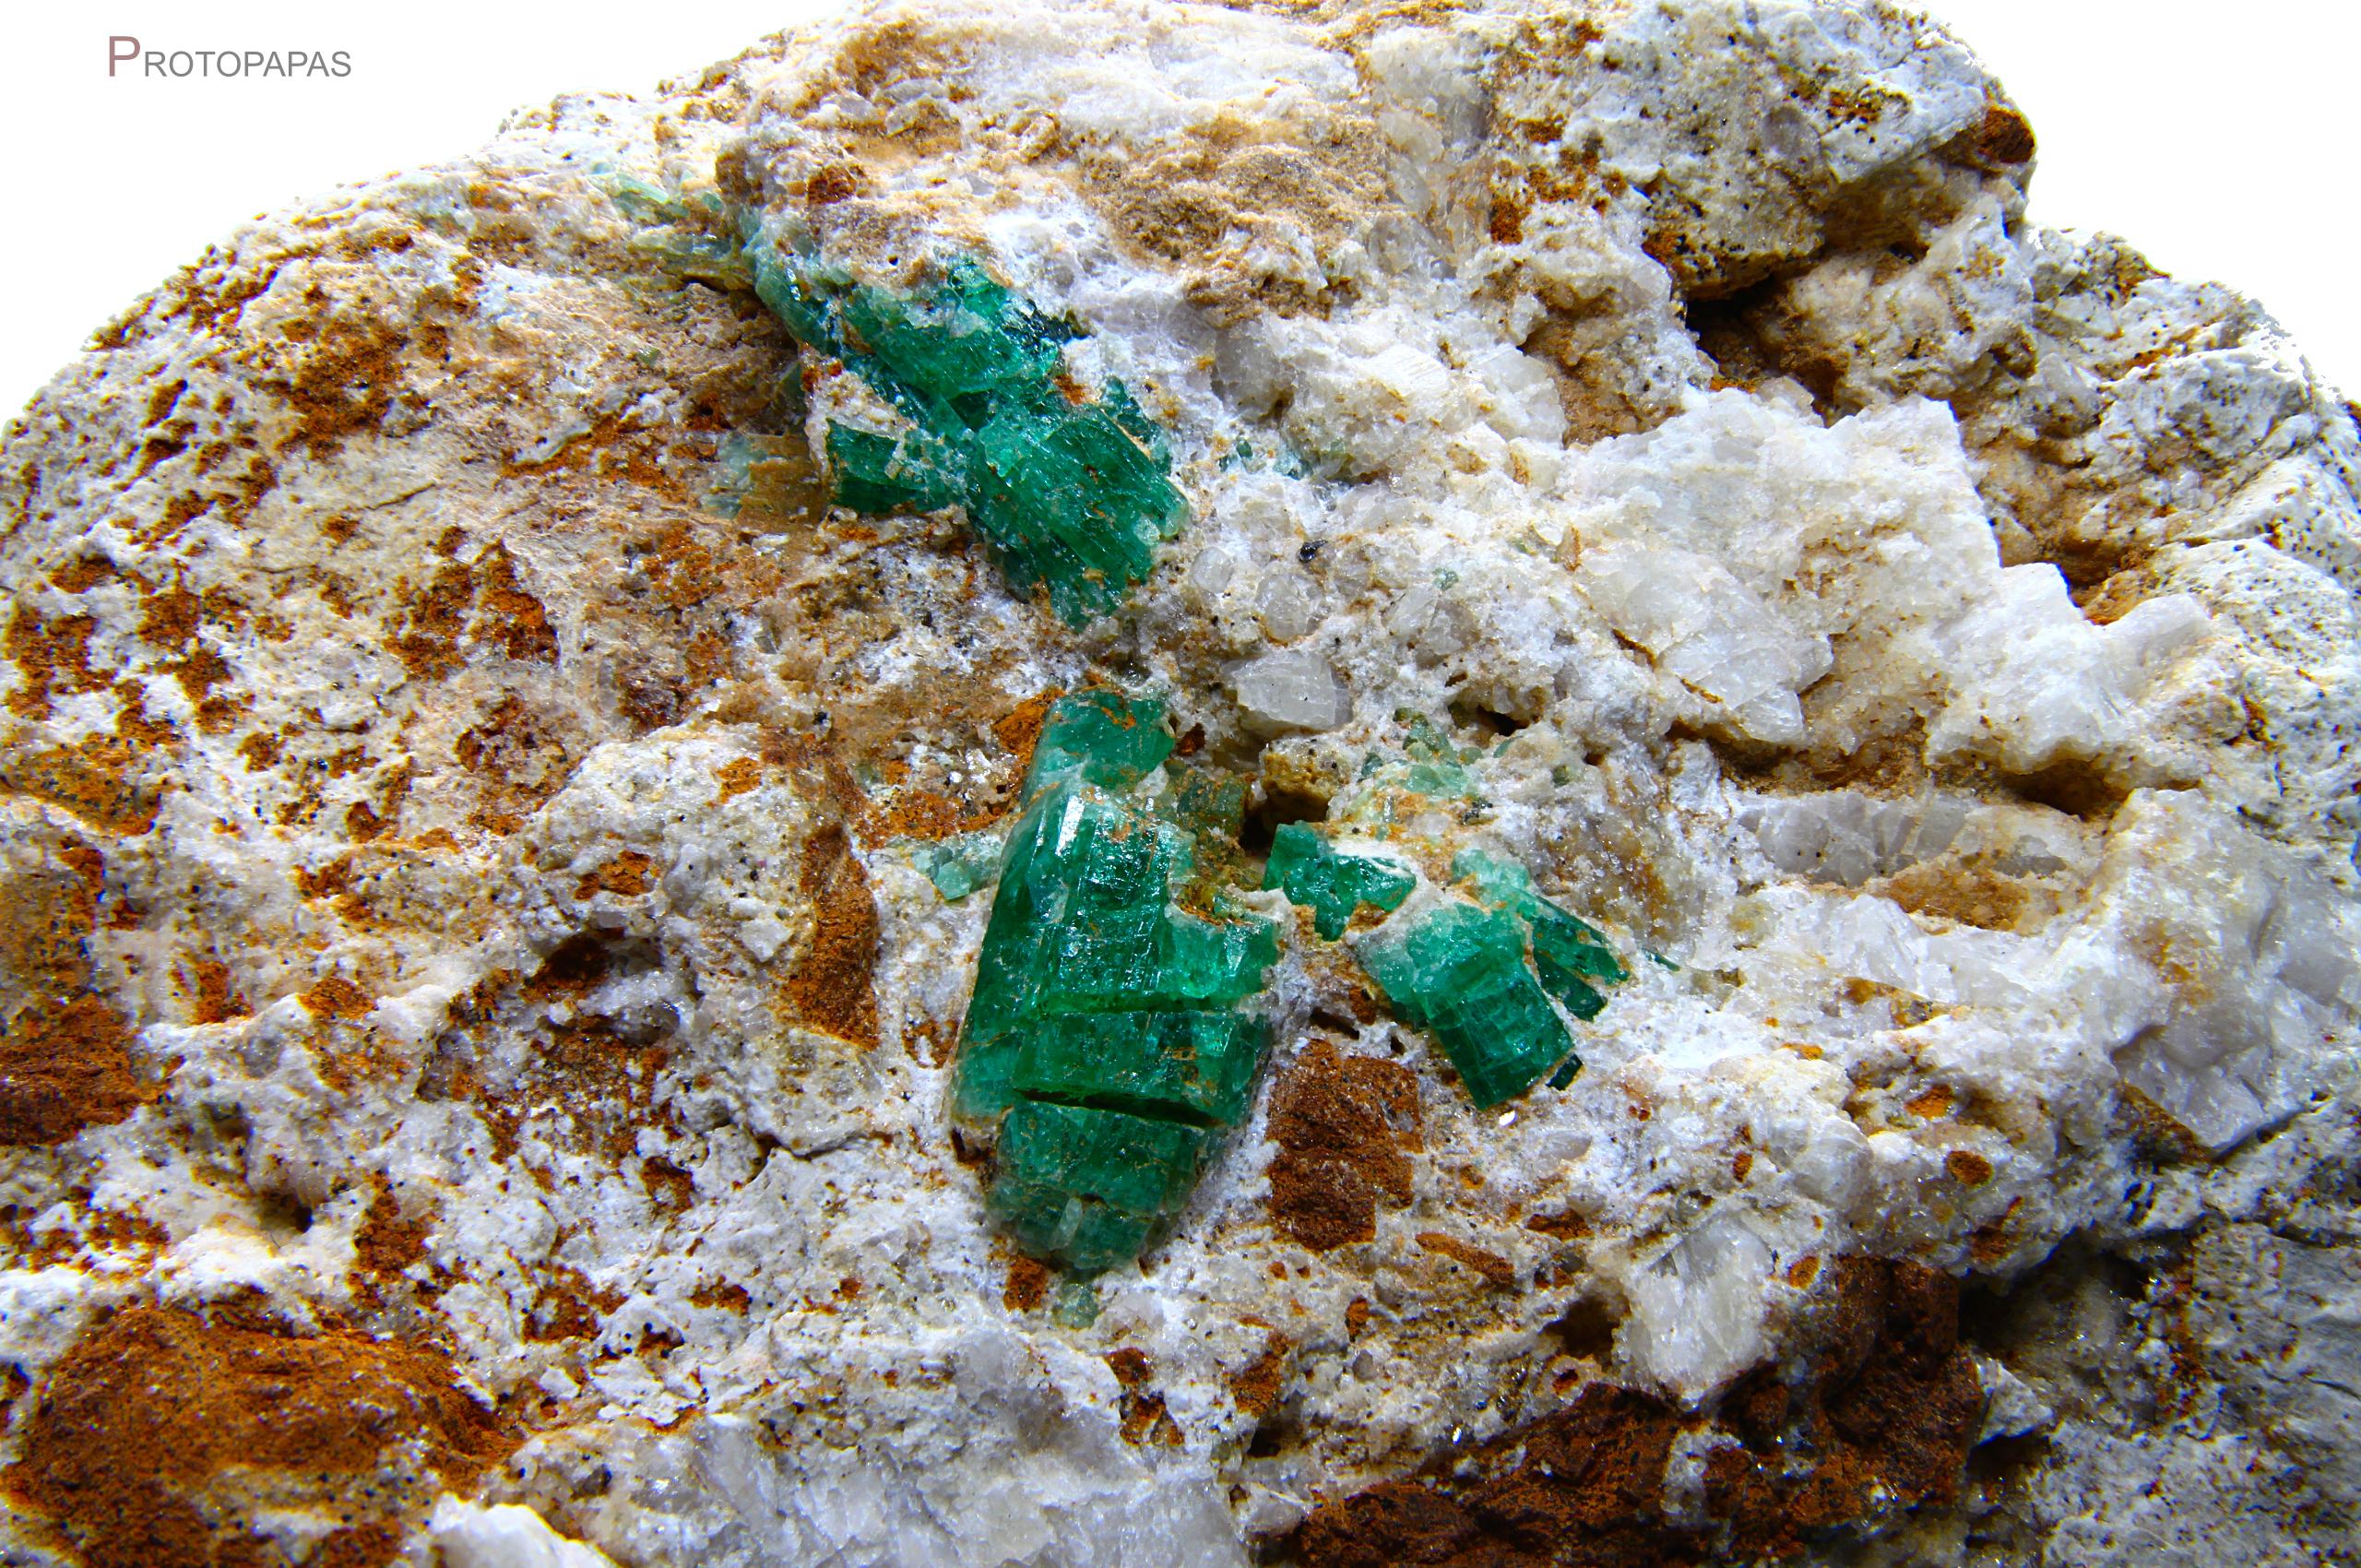 Emerald in matrix from Panjshir in Afghanistan